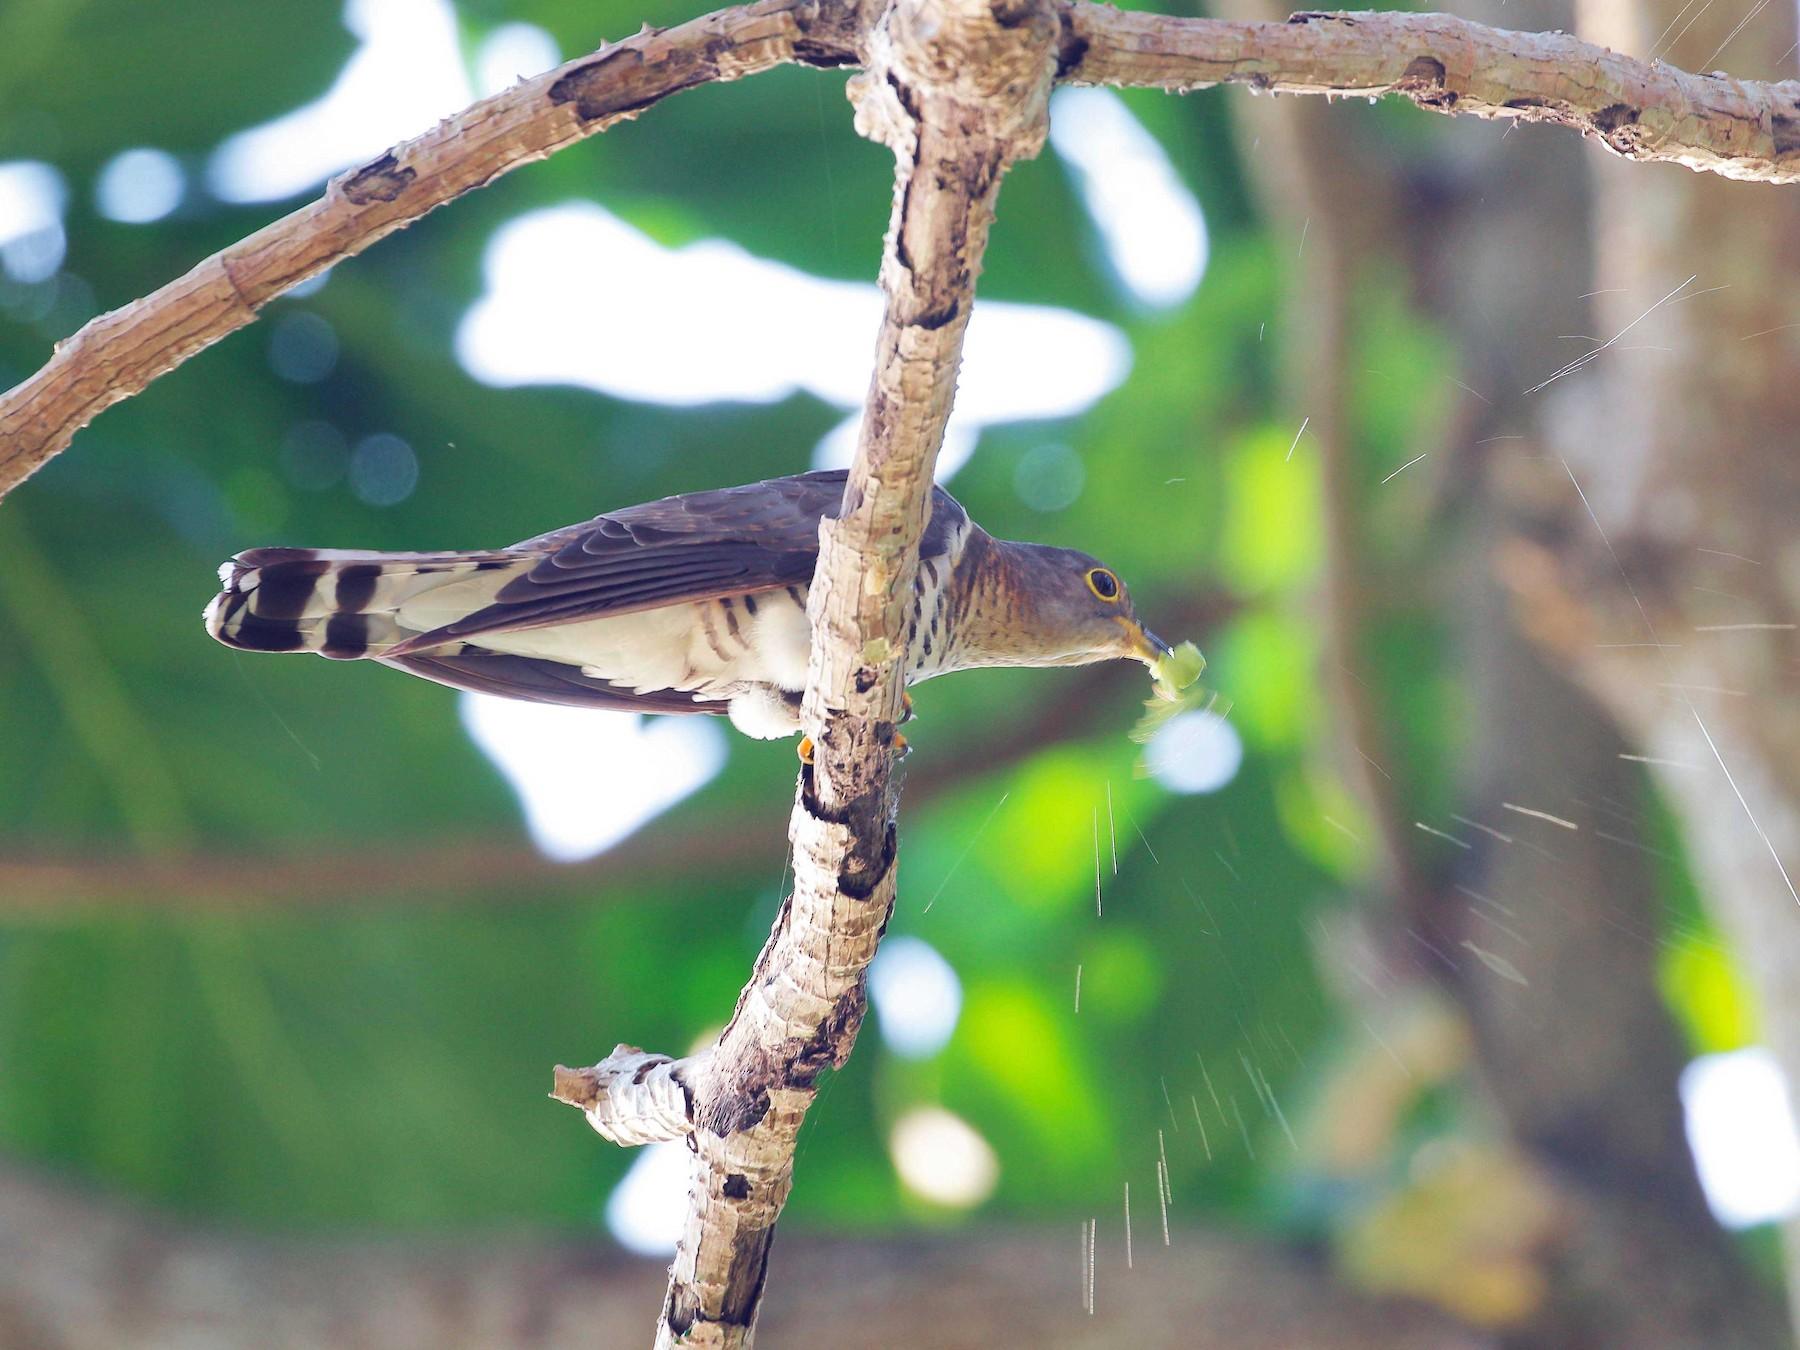 Indian Cuckoo - Neoh Hor Kee